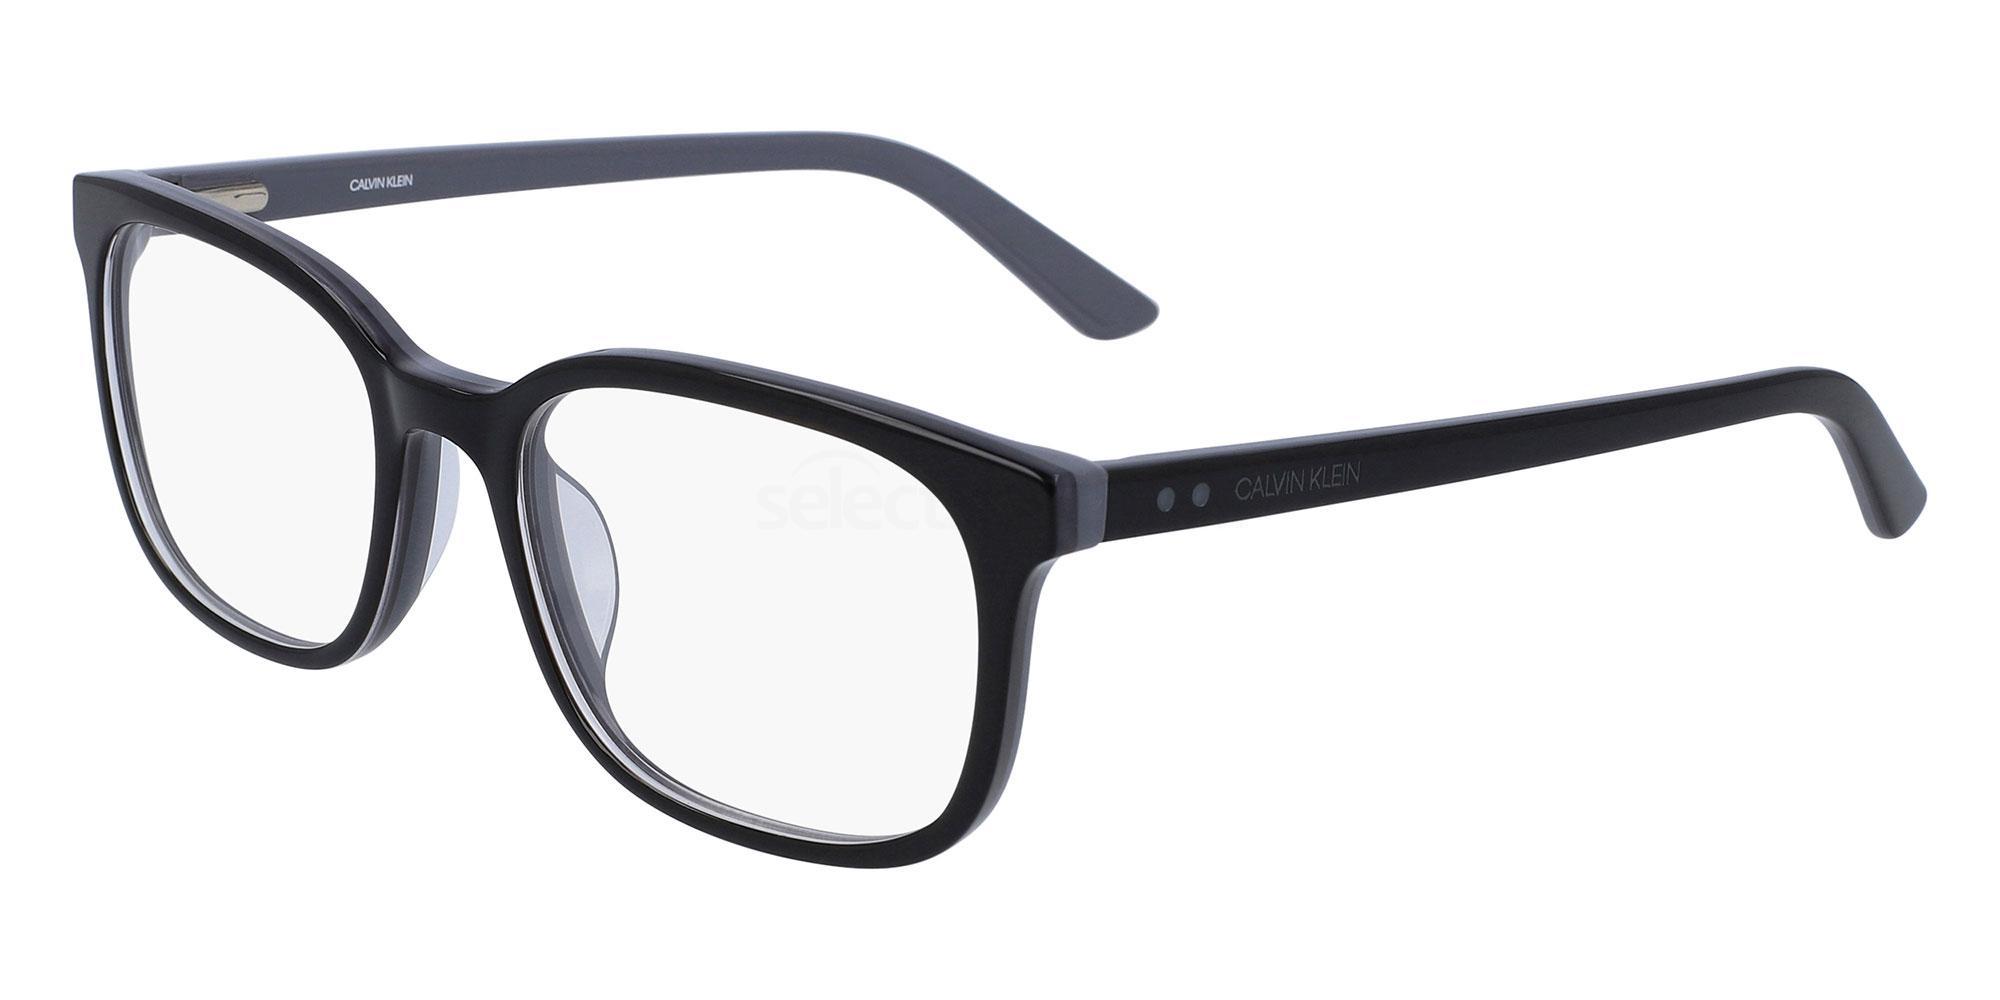 032 CK19514 Glasses, Calvin Klein